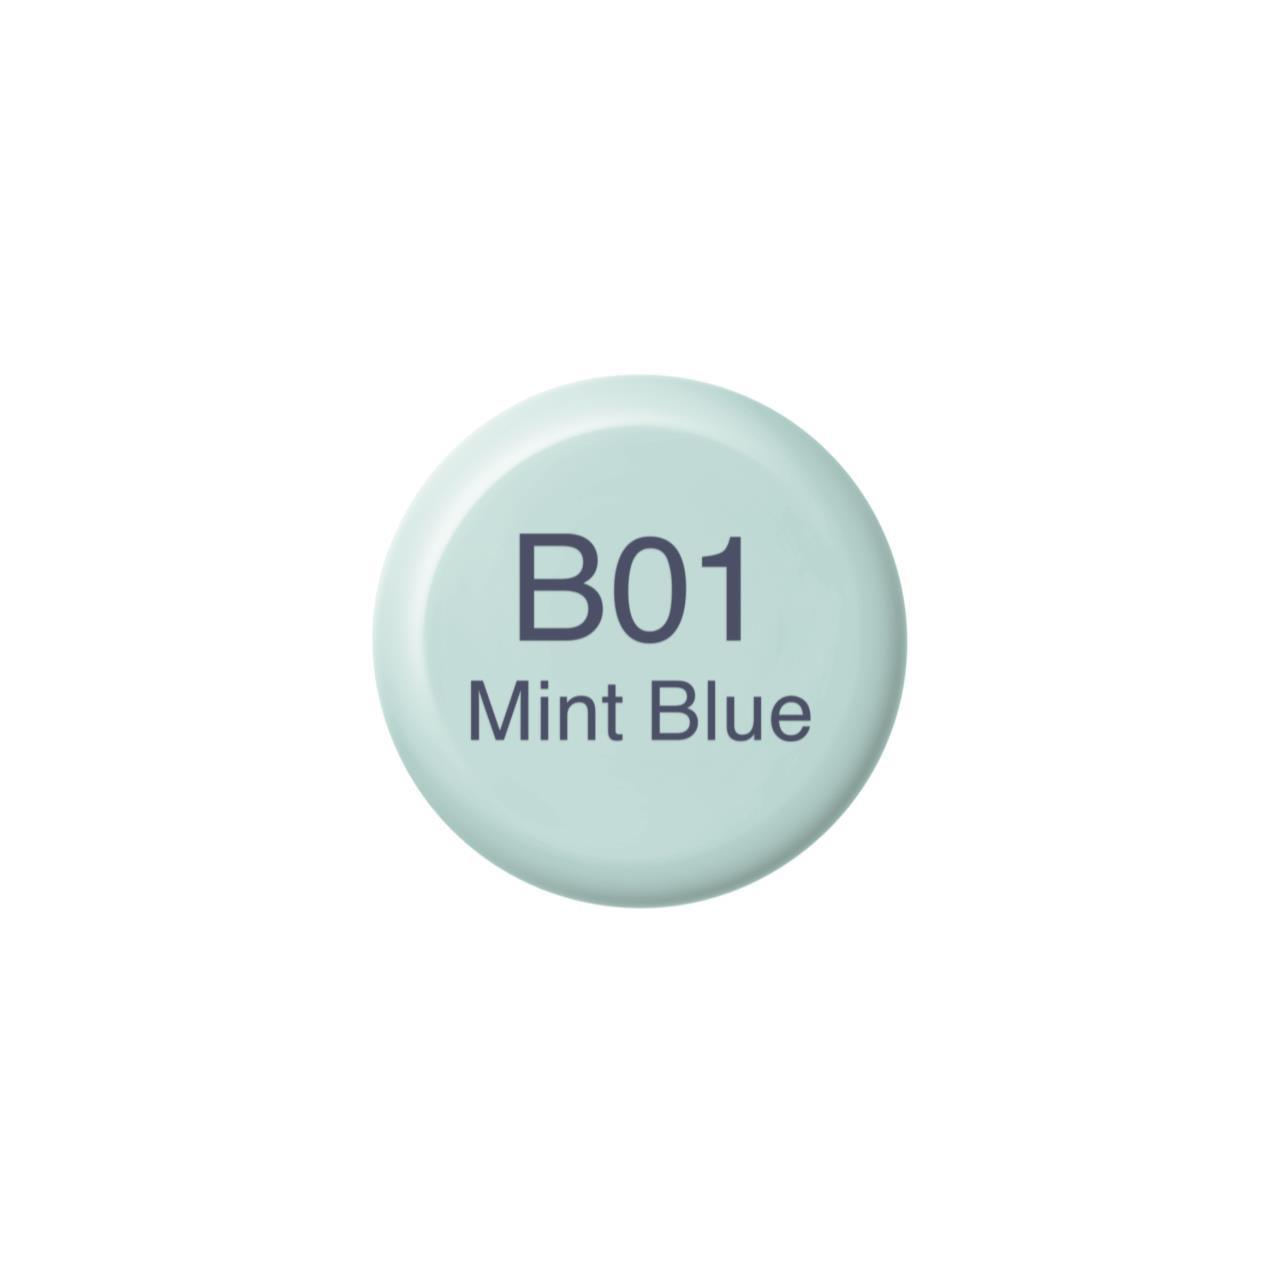 B01 Mint Blue, Copic Ink - 4511338055830